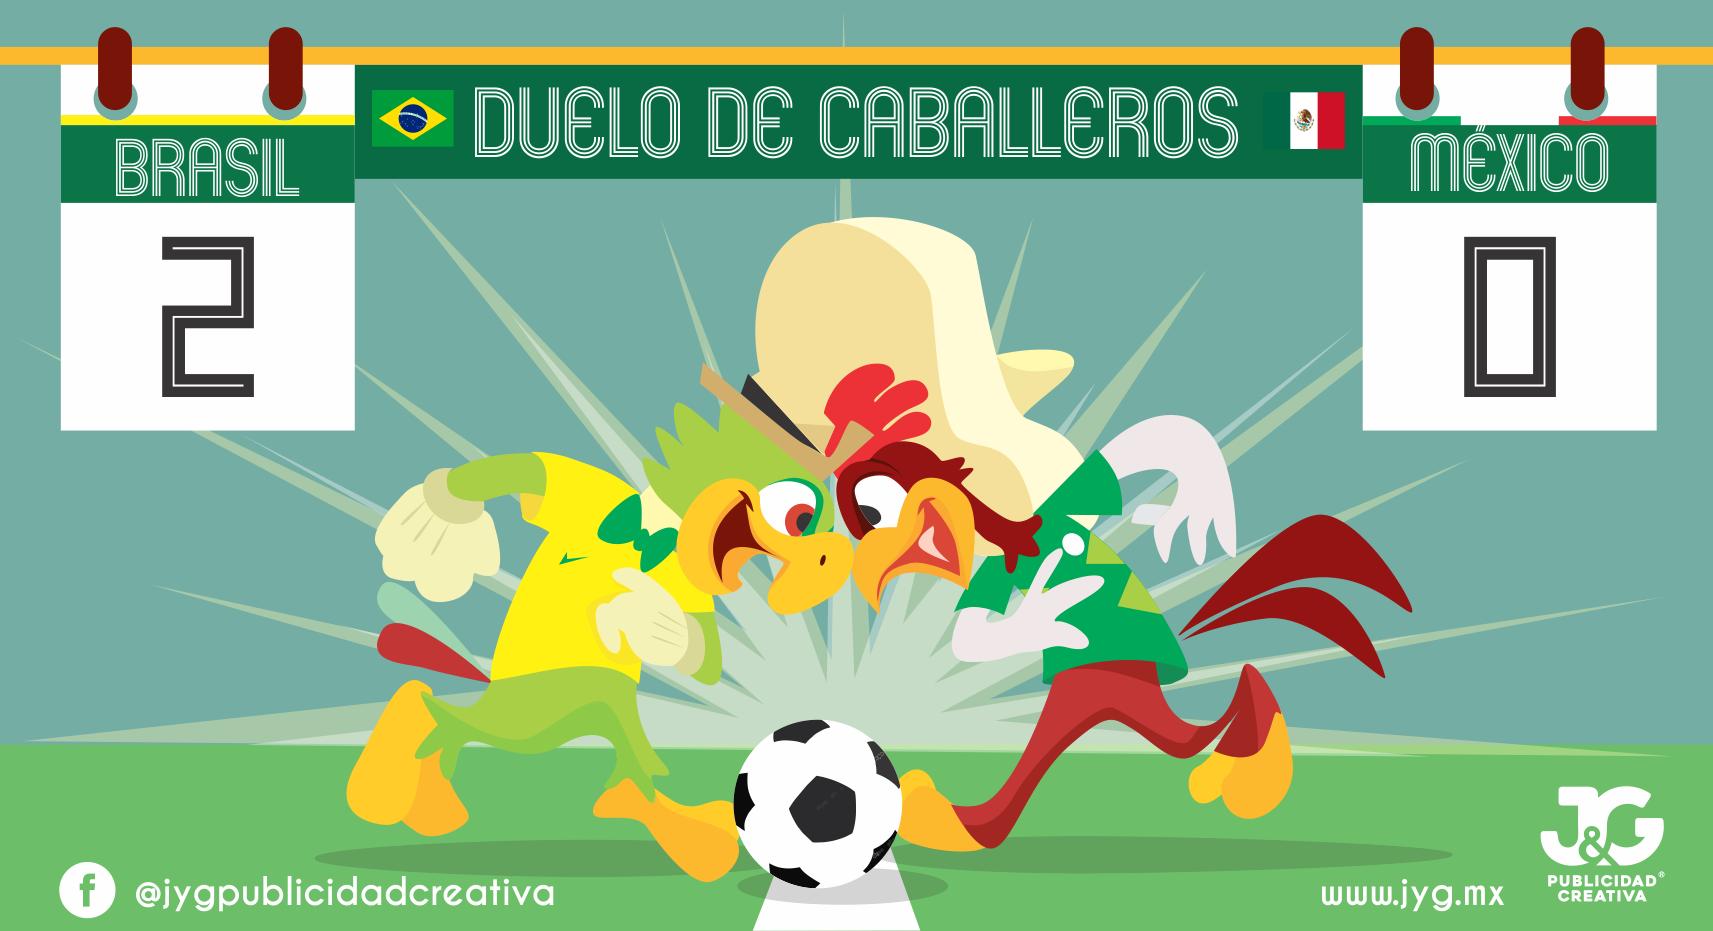 Resultado del partido Brasil- México. Duelo de Caballeros. 🇧🇷 ️🇲🇽